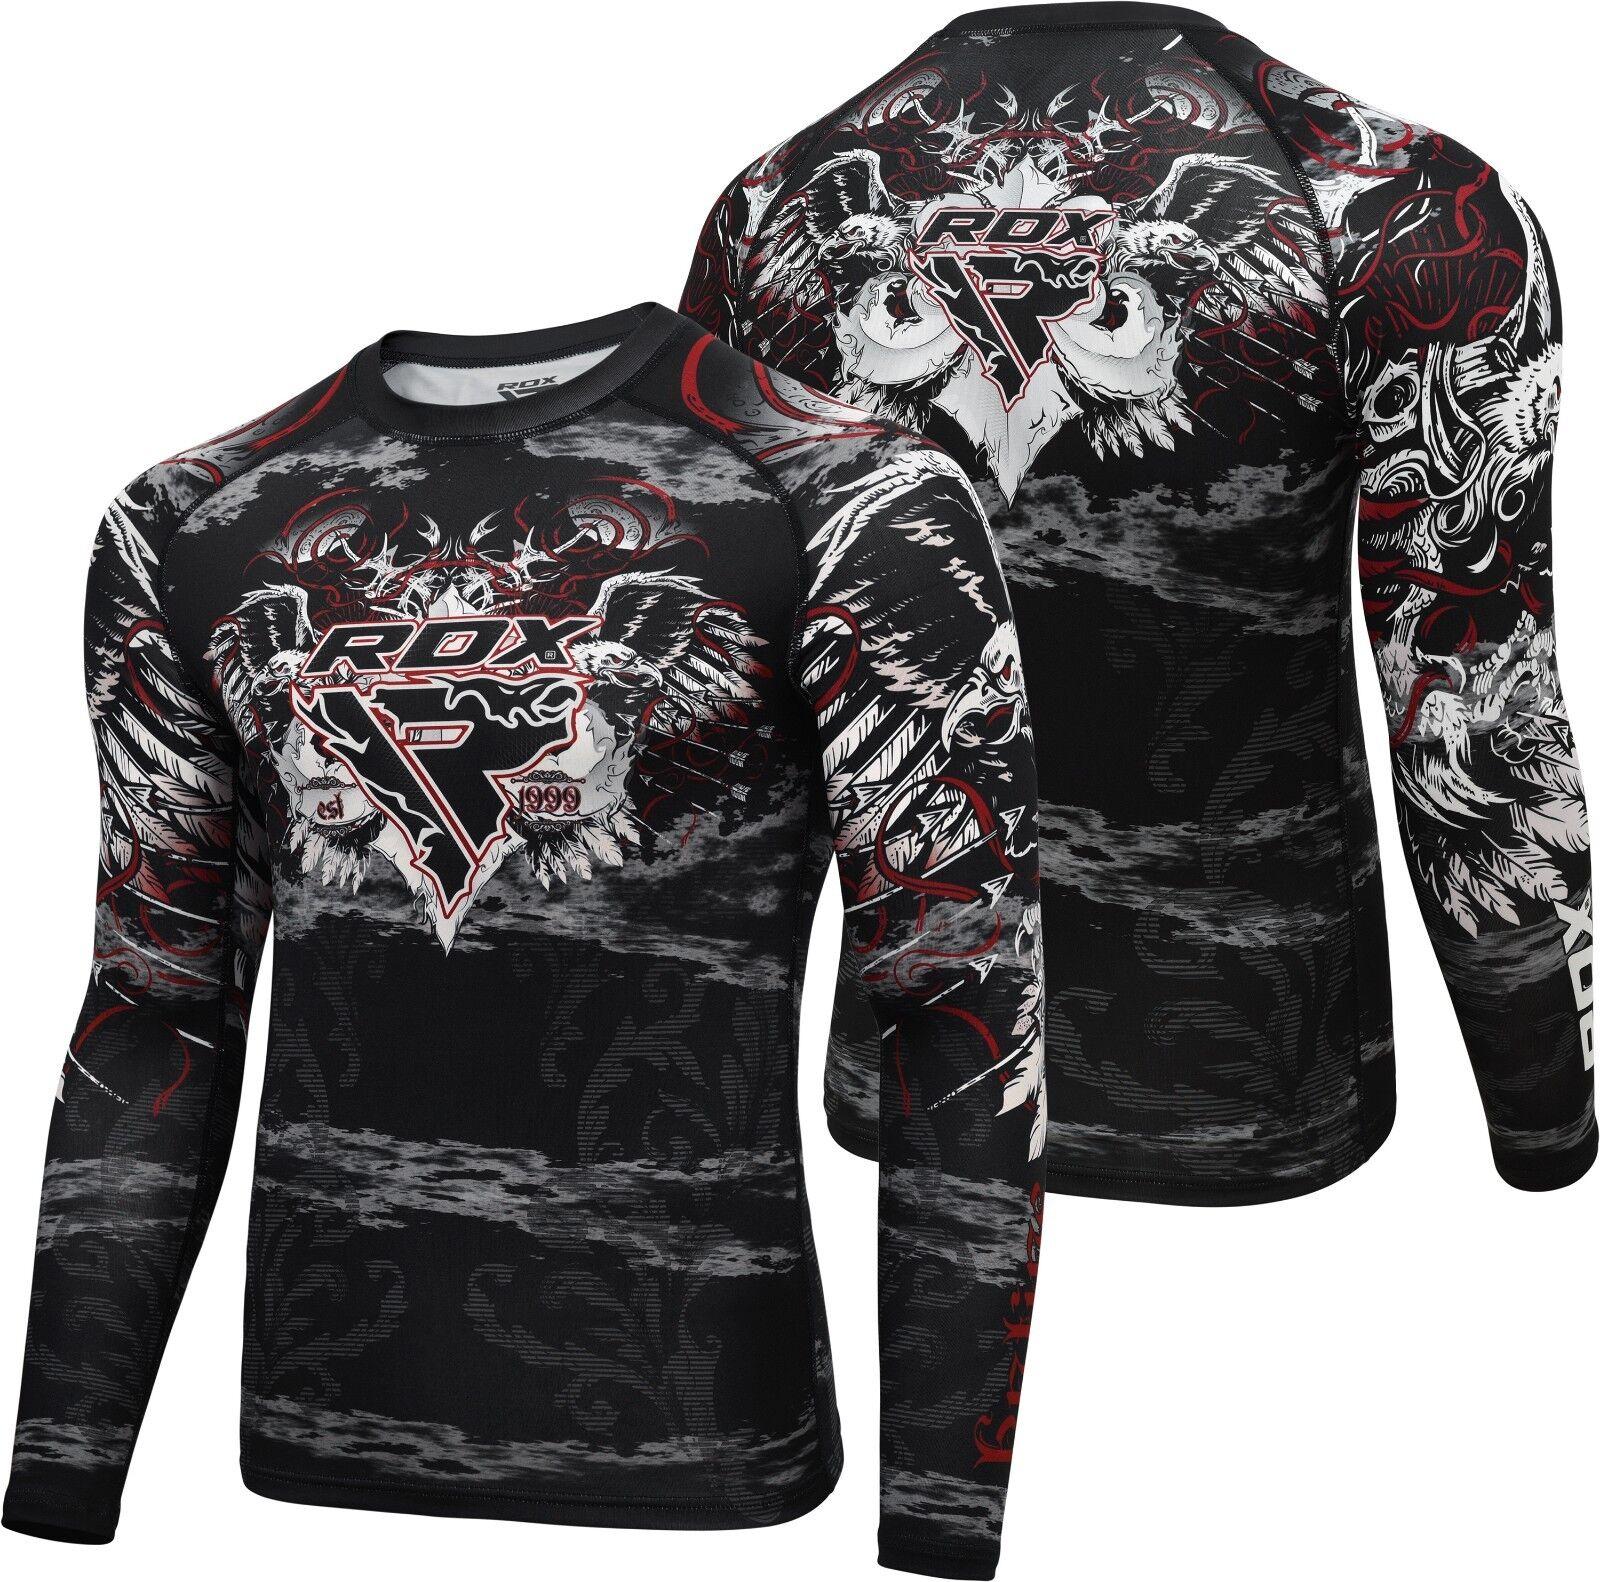 RDX Long Sleeve Weight Loss Sweat Shirt Rash Guard Compression Shirt MMA Running